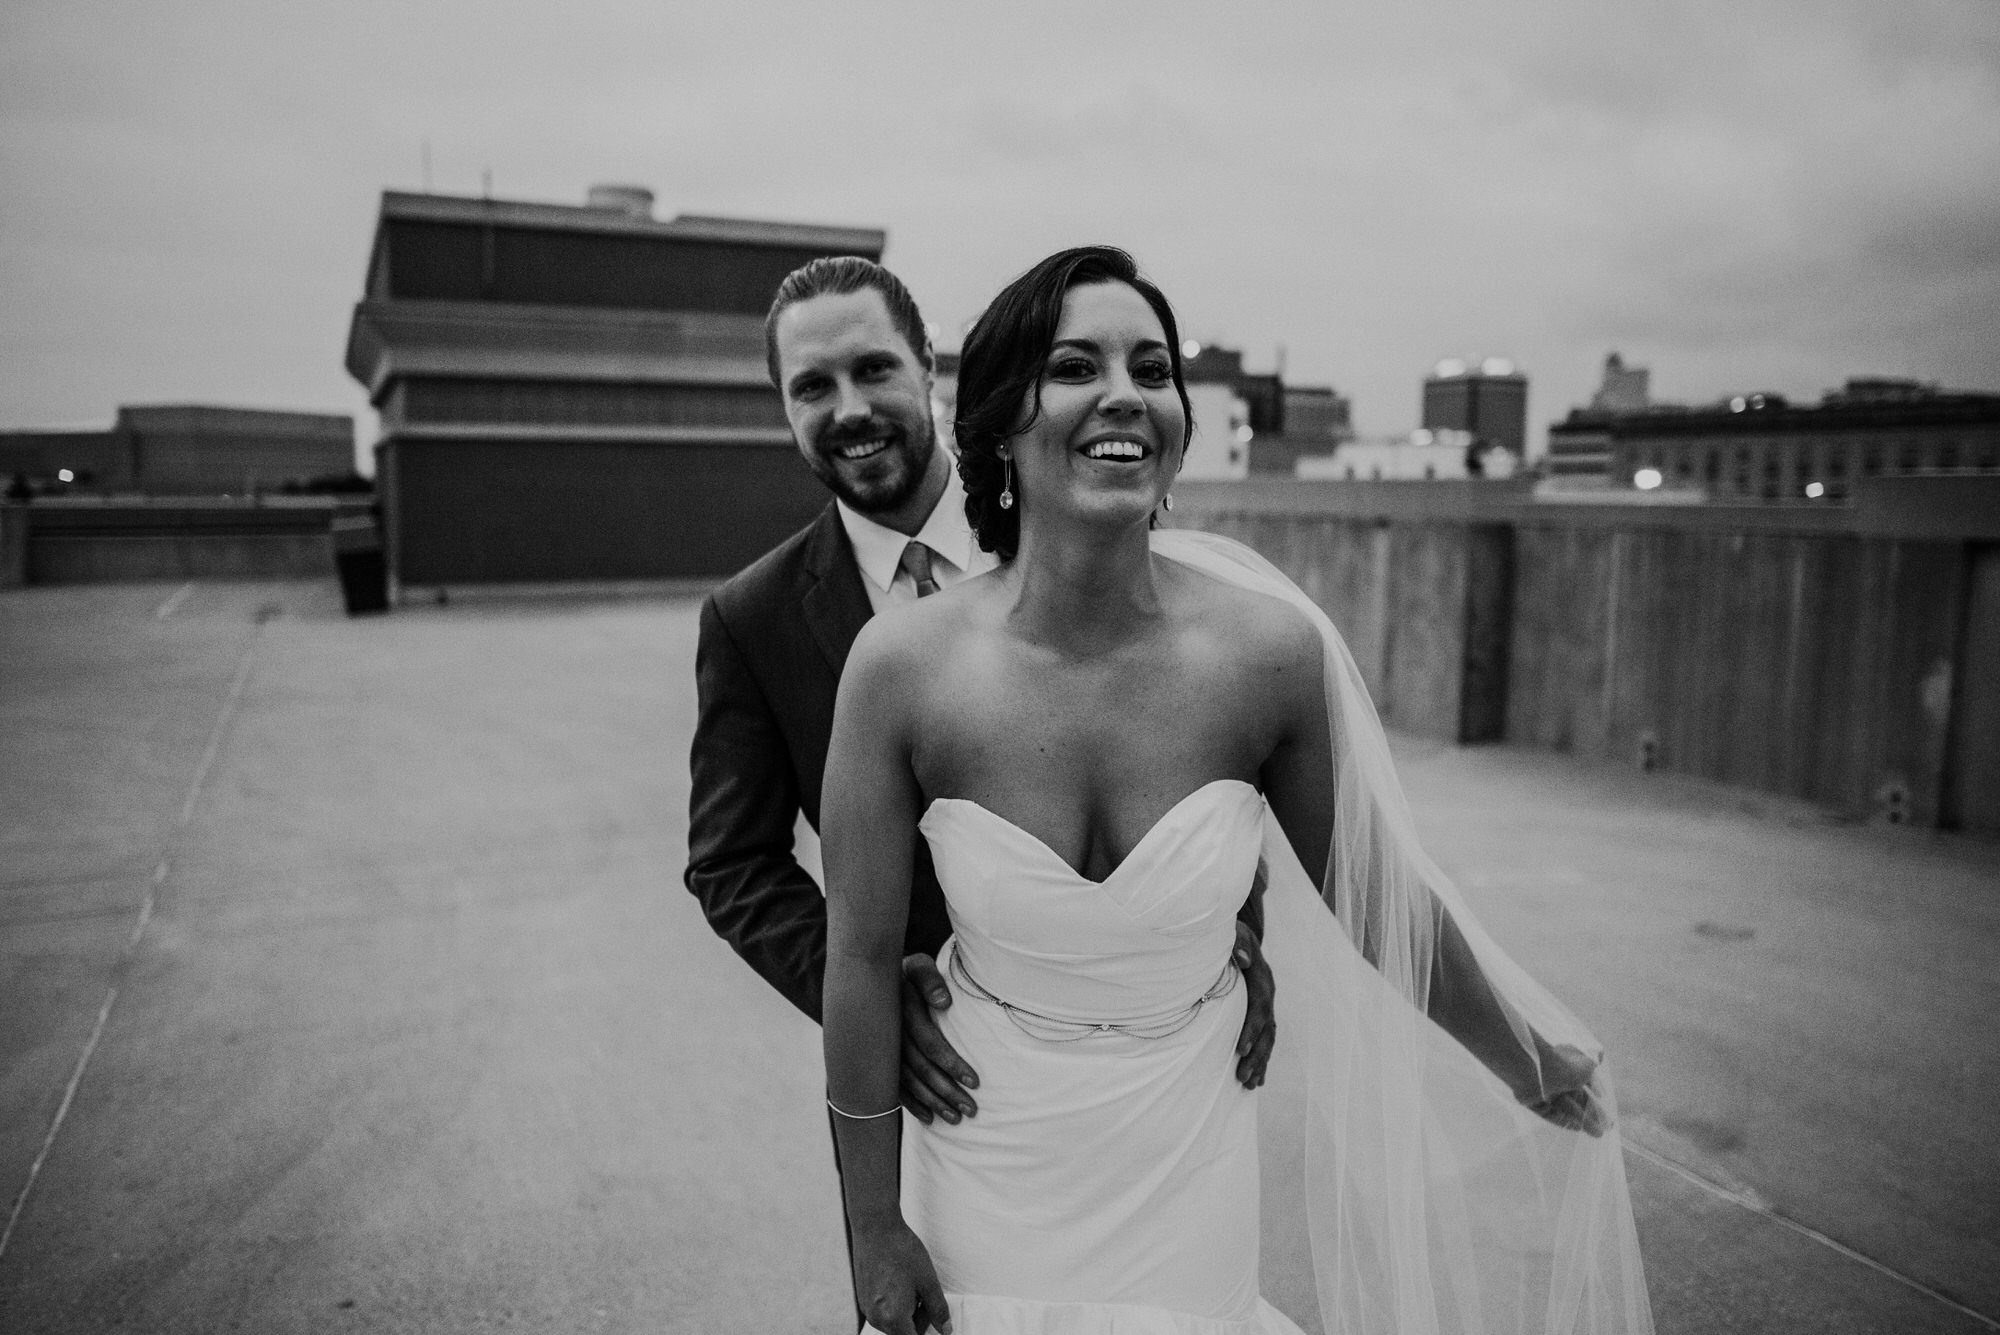 Kaylie_Sirek_Photography_Grand_Island_Kearney_Hastings_Lincoln_Nebraska_Wedding_Engagement_Grandma_Grandparent_Delray_Downtown_DowntownLincoln_LNK_Emotional_Bride_Groom_Photographer_67.jpg